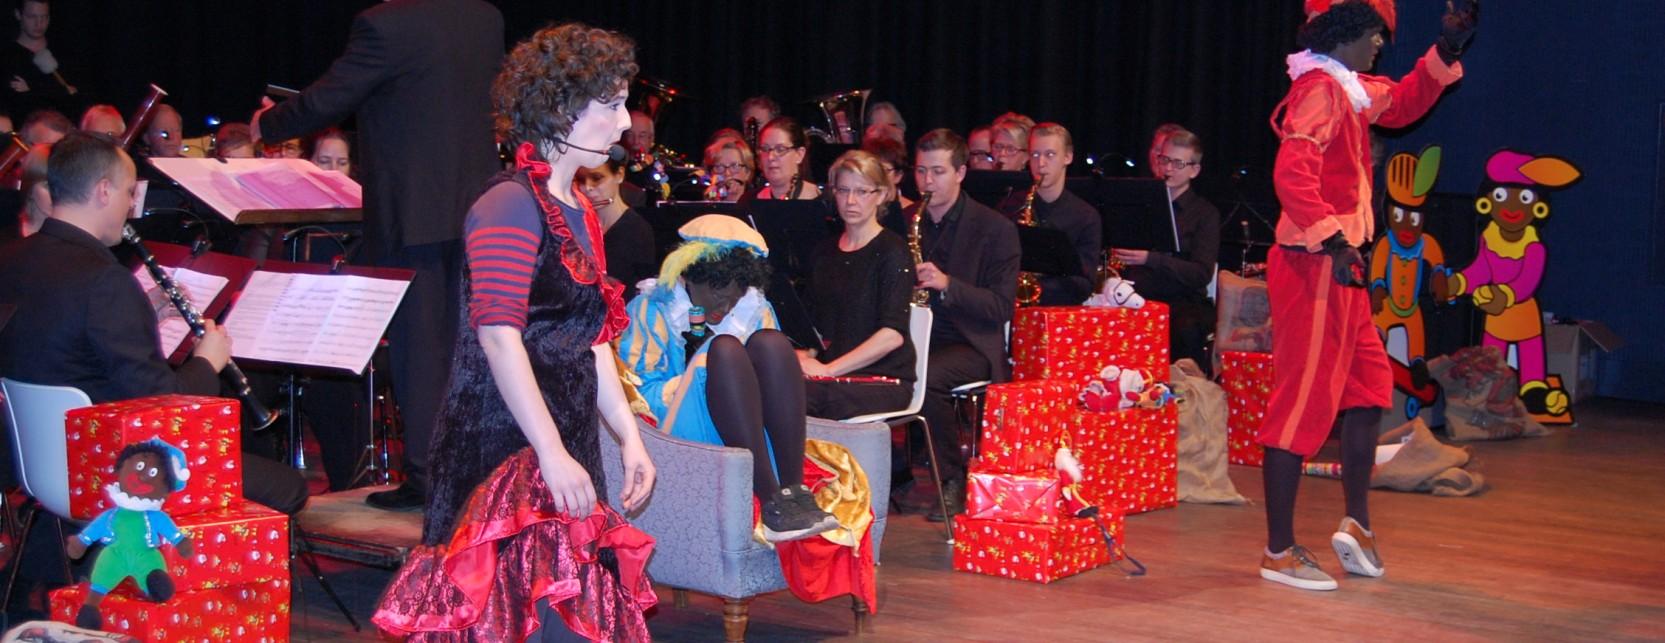 Pepernotenconcert Sinterklaas KHC Elckerlyc Hilvarenbeek